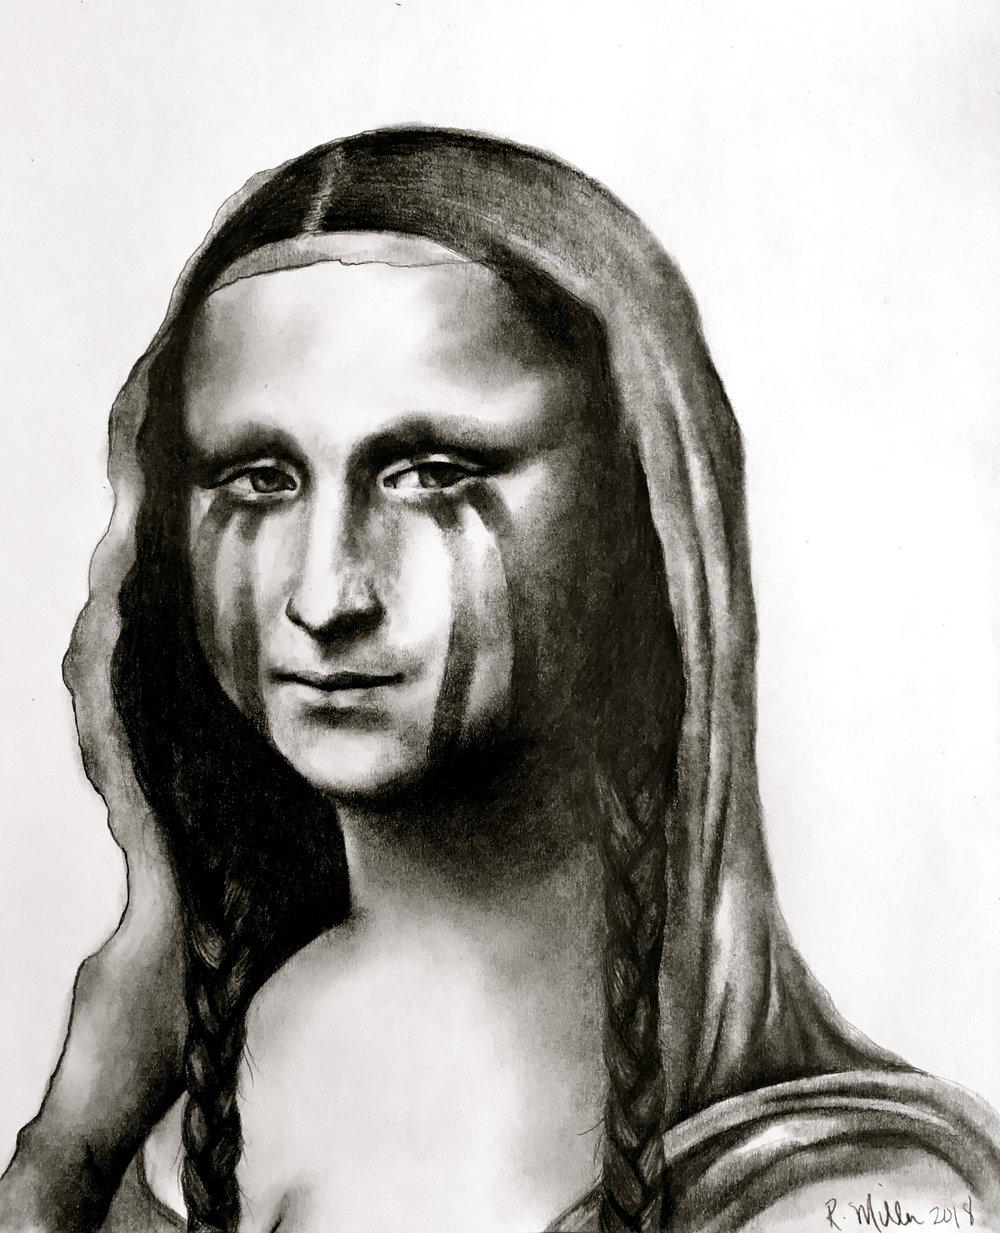 War Paint Mona Lisa, 2018   #2 pencil on paper